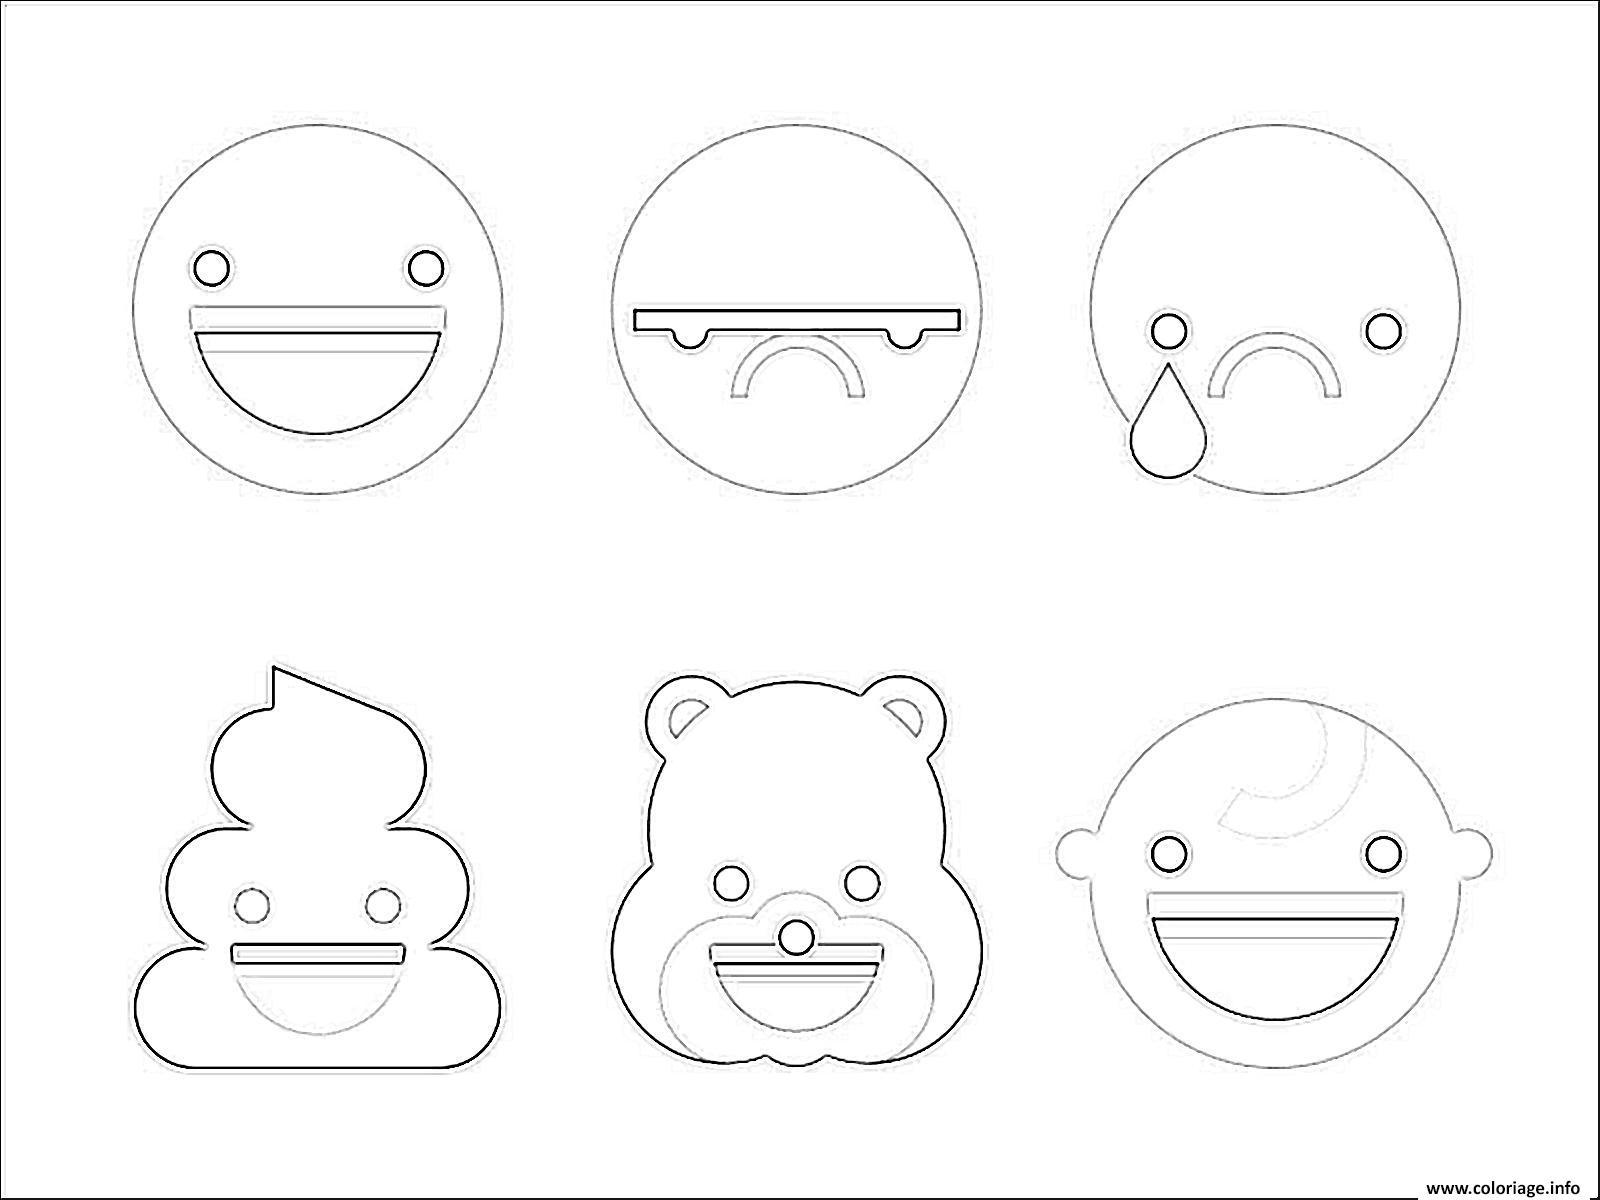 Coloriage Emoji A Imprimer